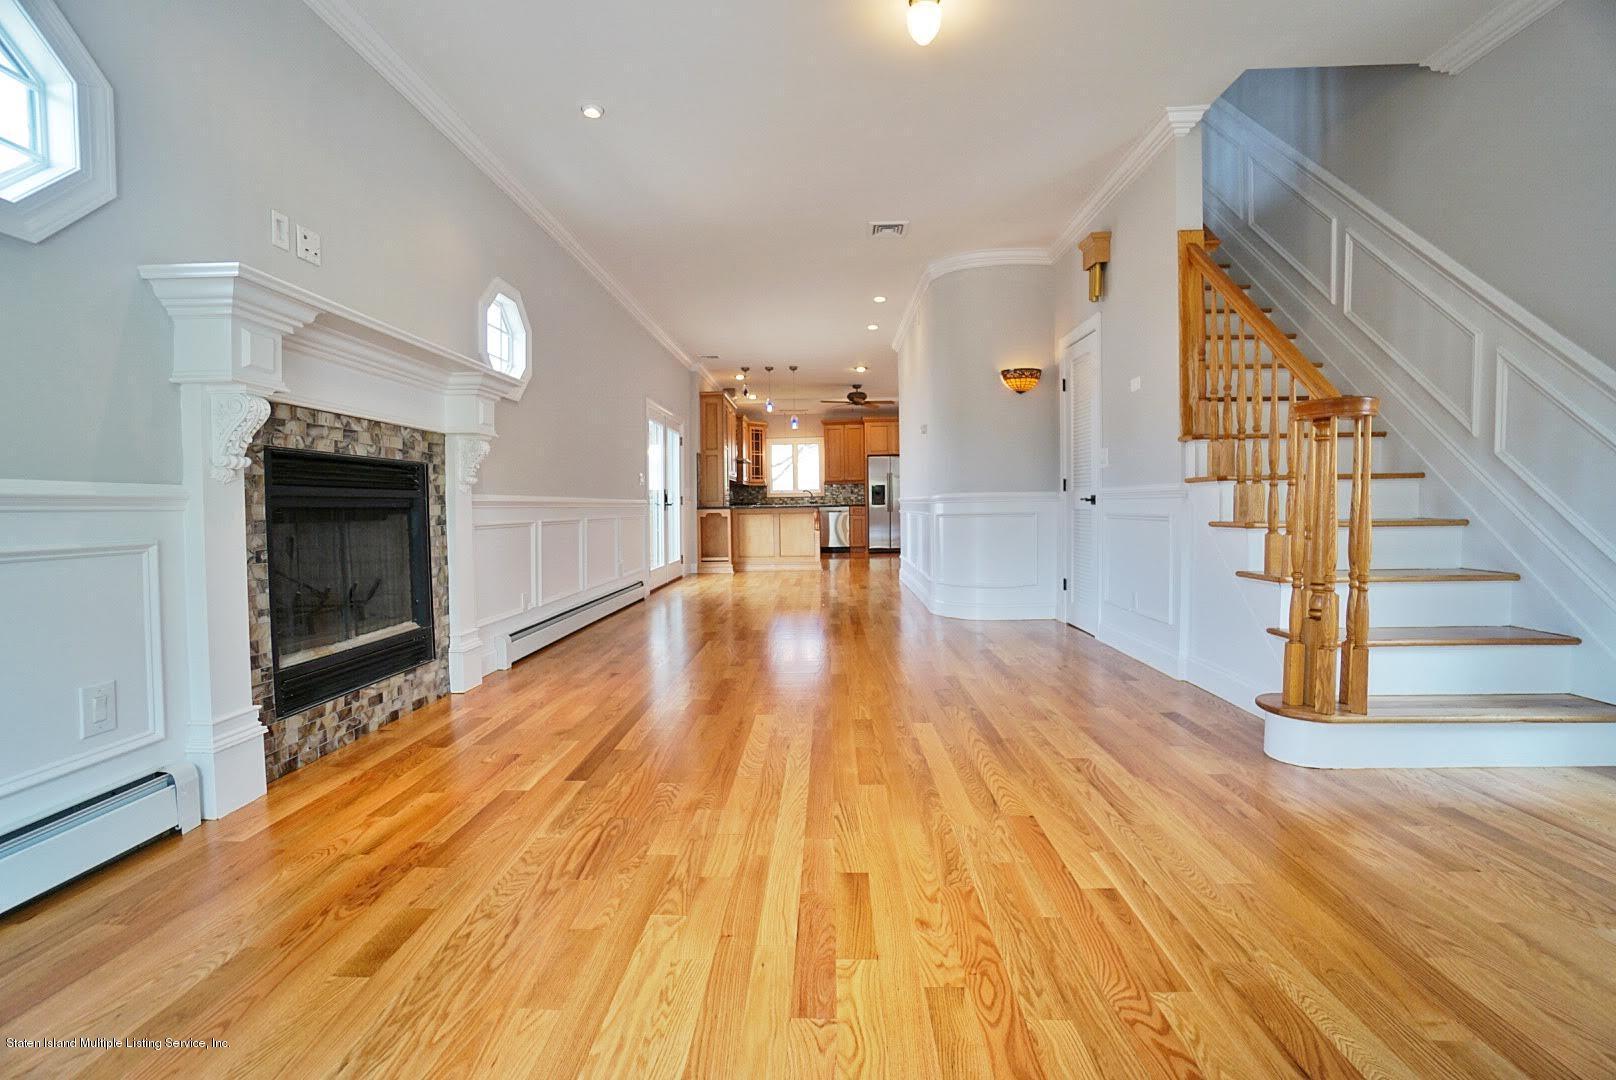 Single Family - Detached 445 Manhattan Street  Staten Island, NY 10307, MLS-1130505-5